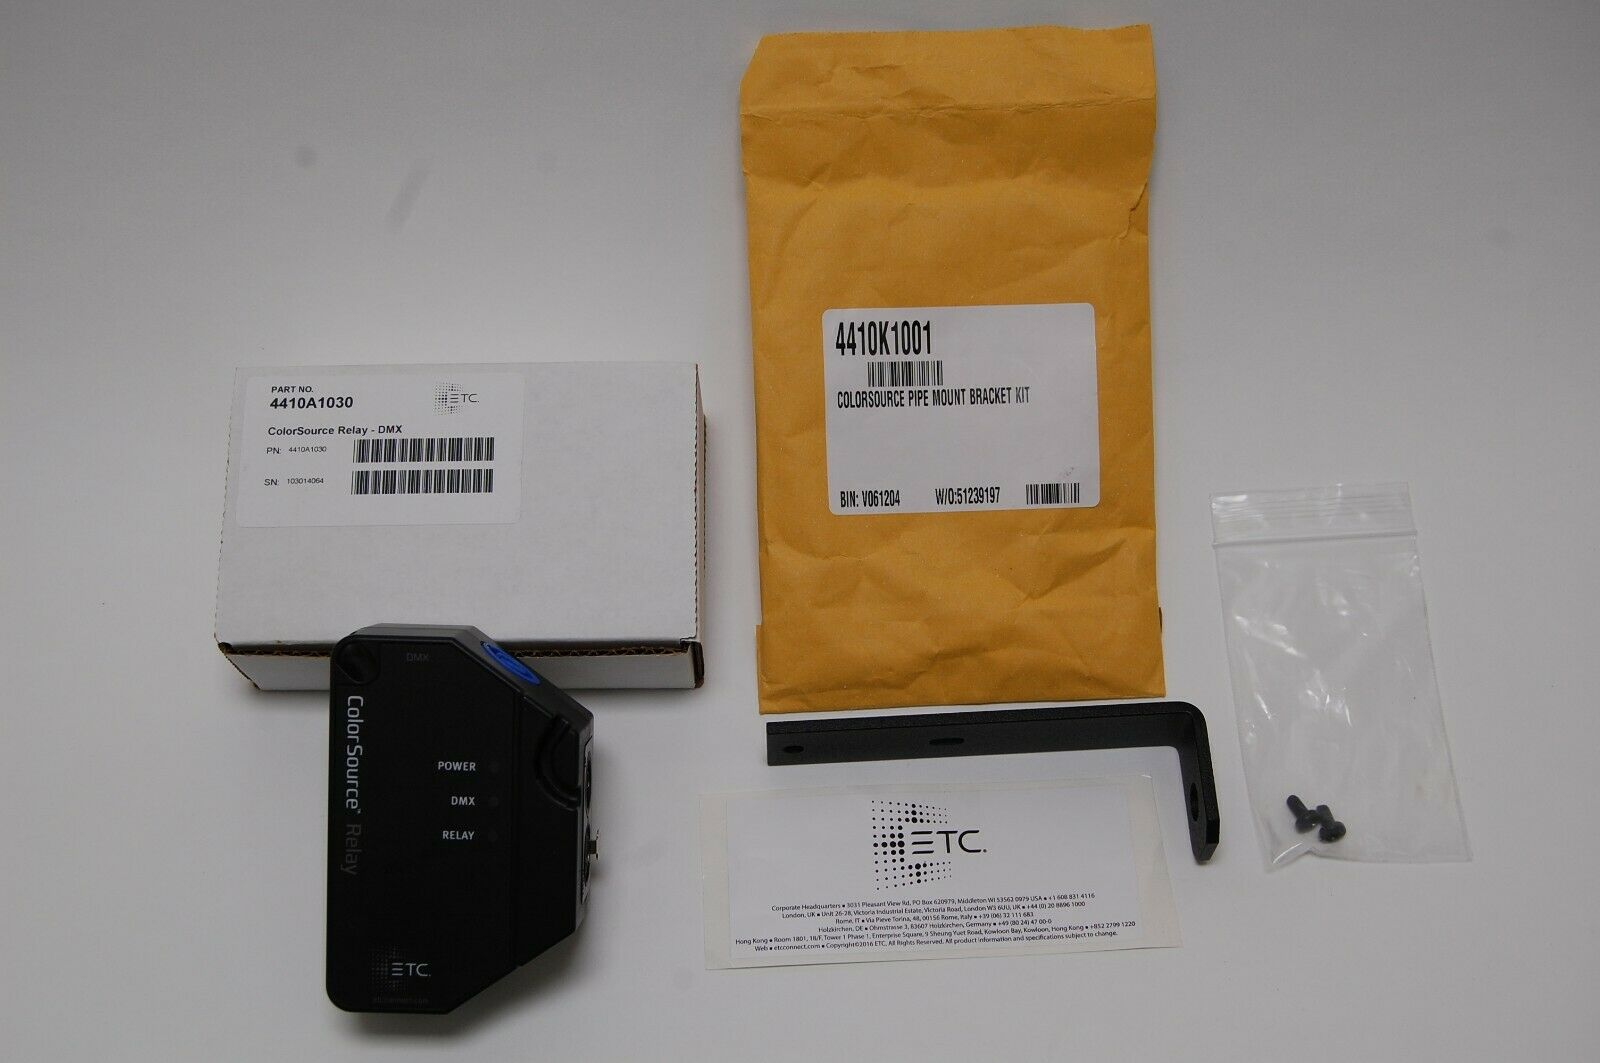 ETC FarbeSource Relais - DMX - 4410A1030, New w Garantie, Sold W  Pipe Bracket